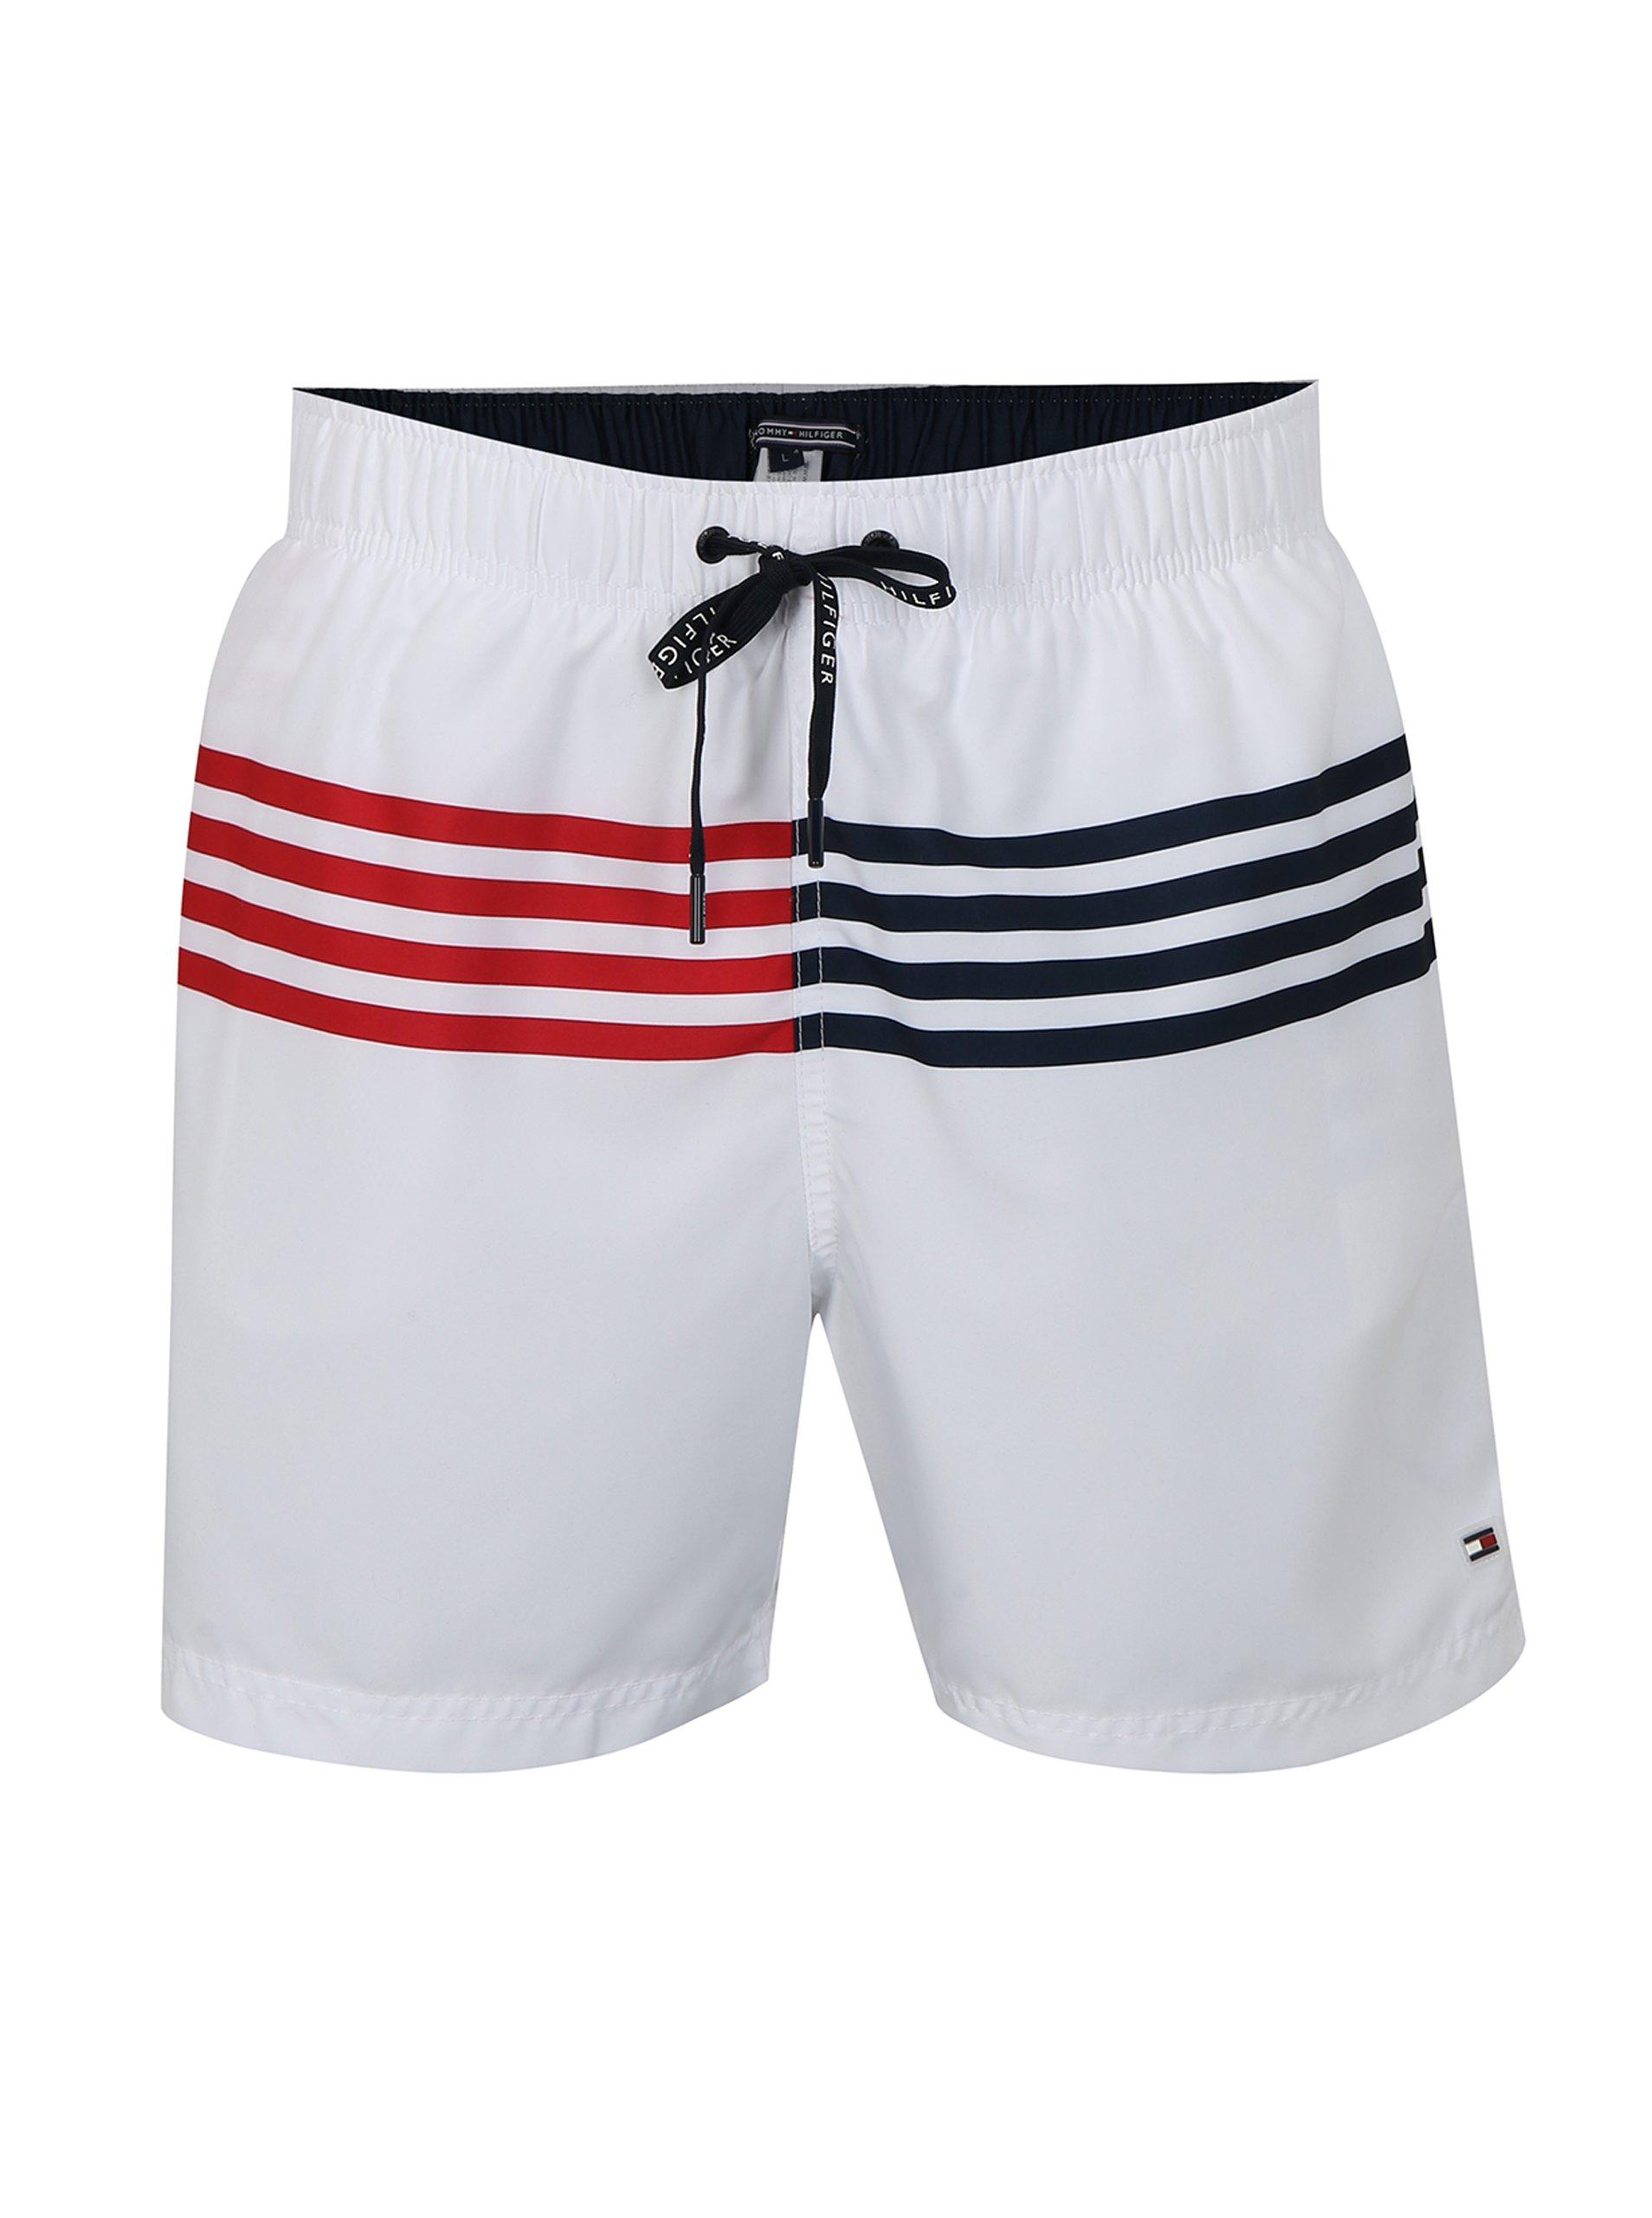 fd6ff721b Biele pánske plavky Tommy Hilfiger | Moda.sk